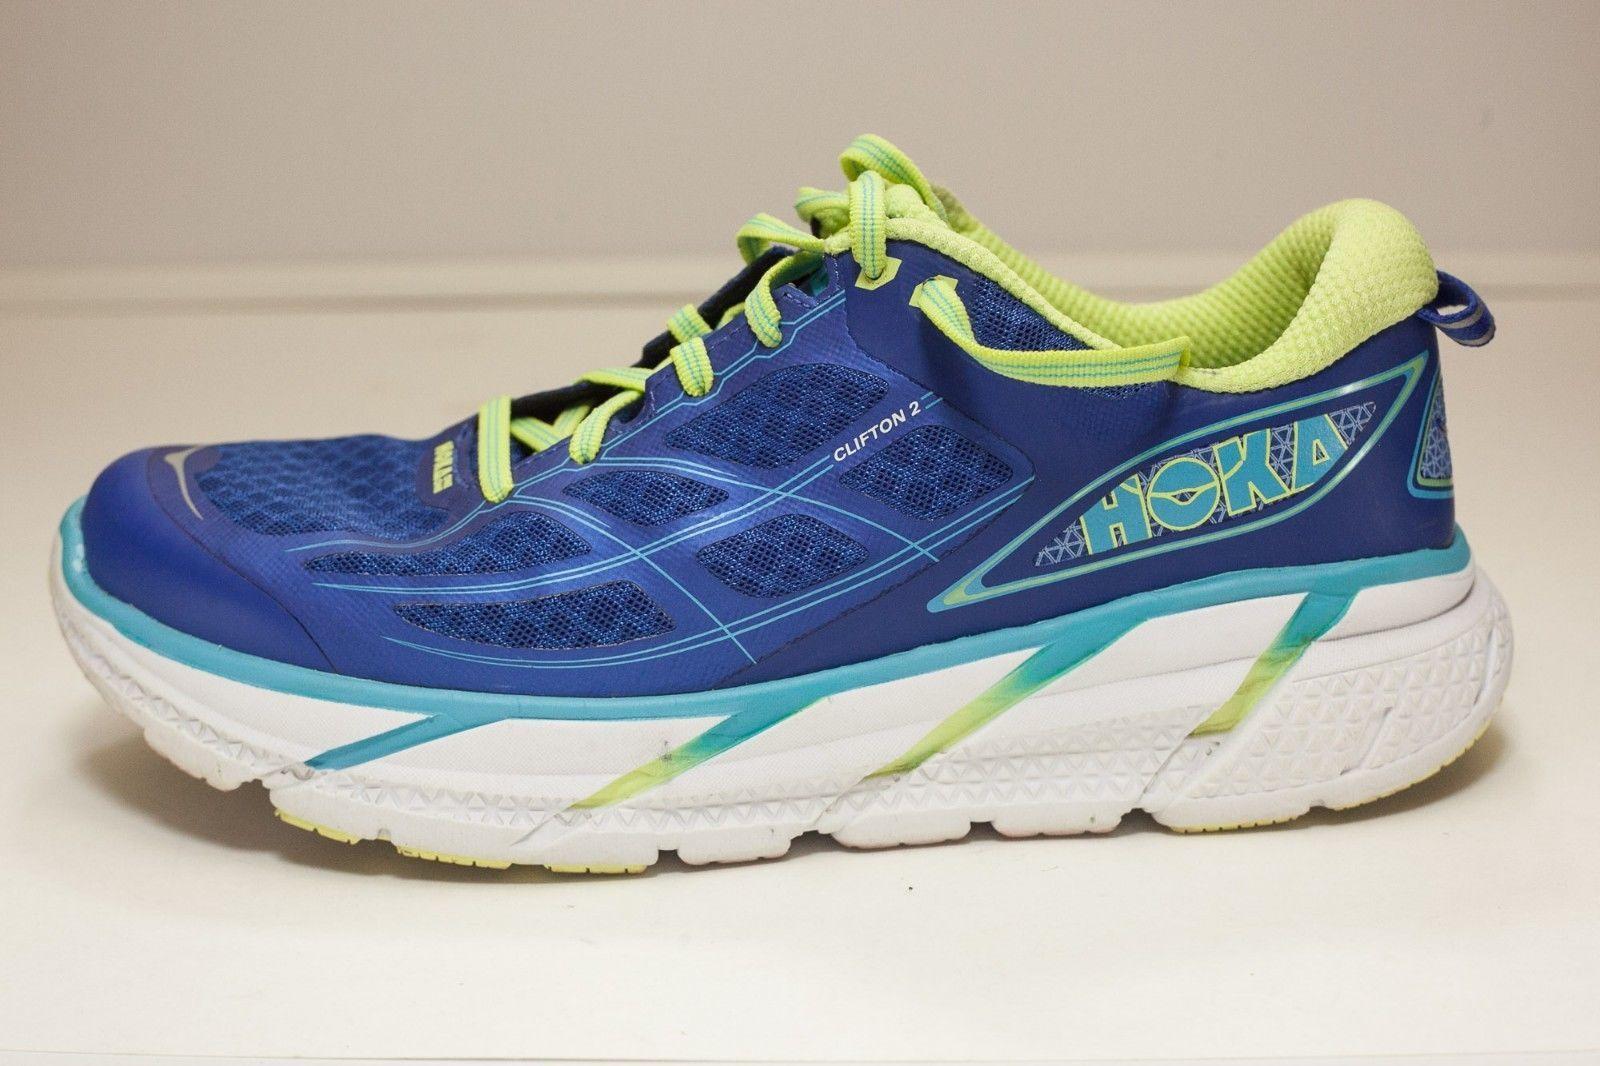 Hoka Size 10 Blue Men's Running Shoes